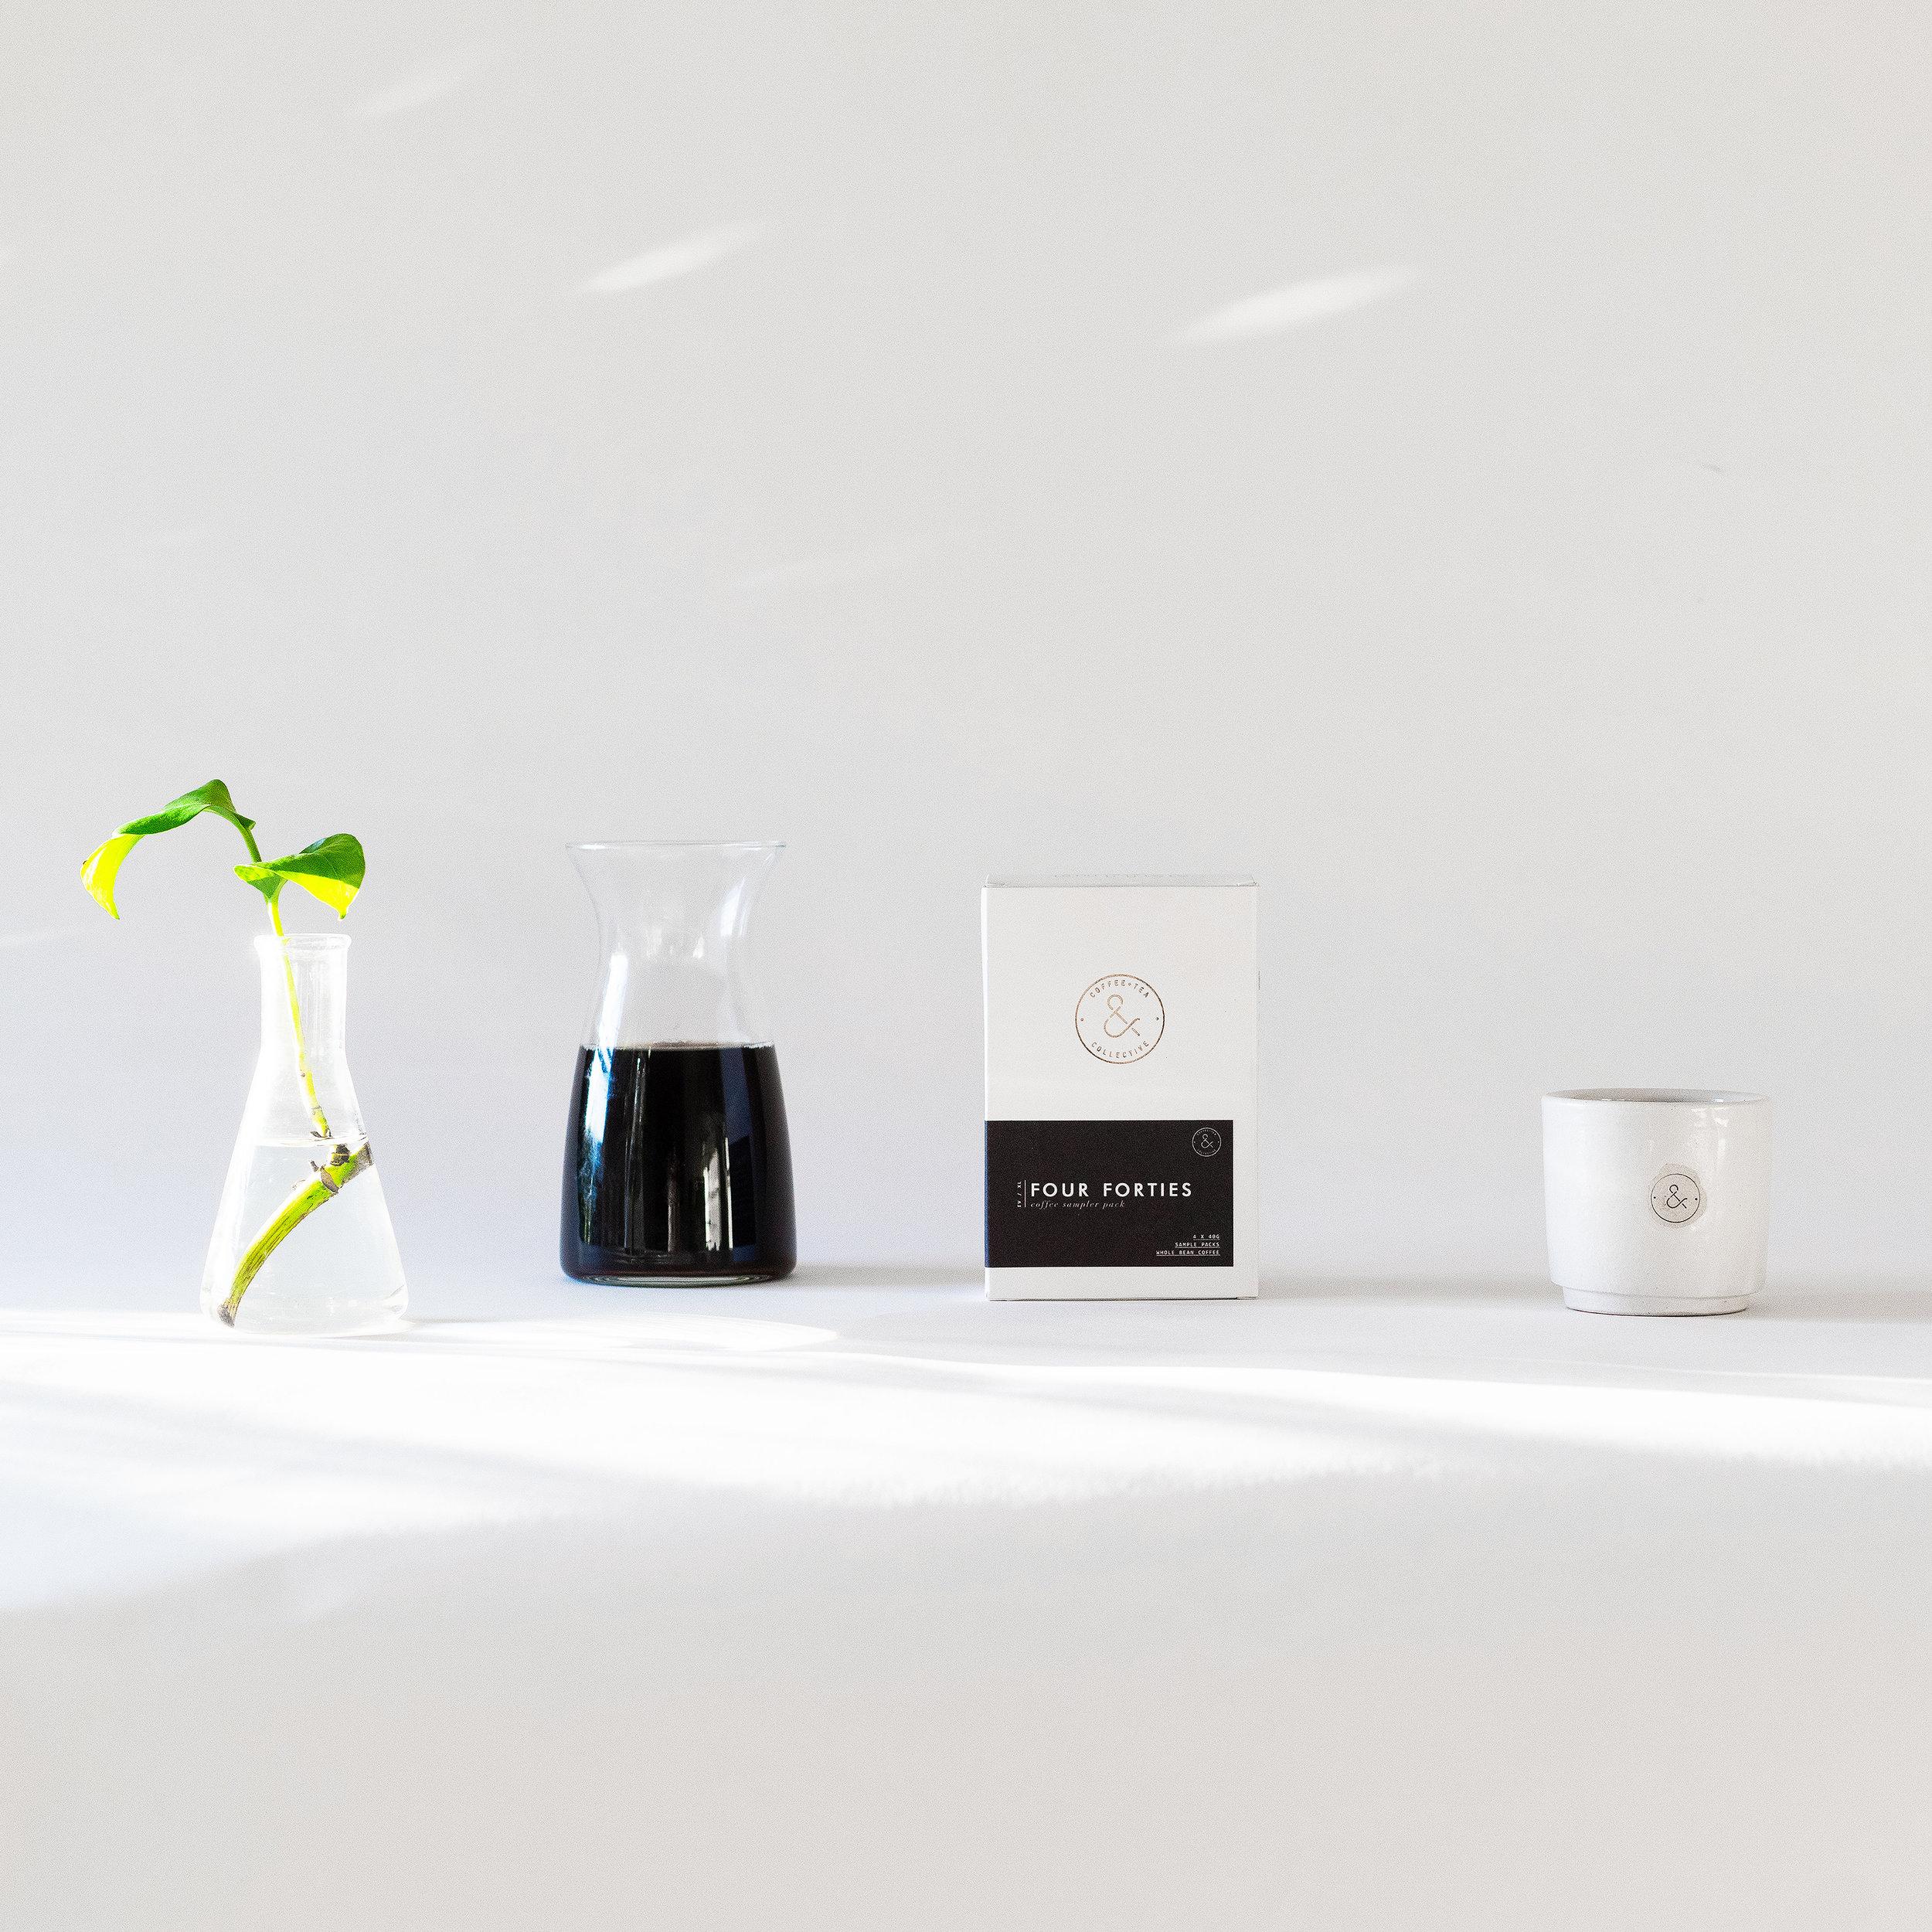 coffee box design packaging minimal modern monochrome